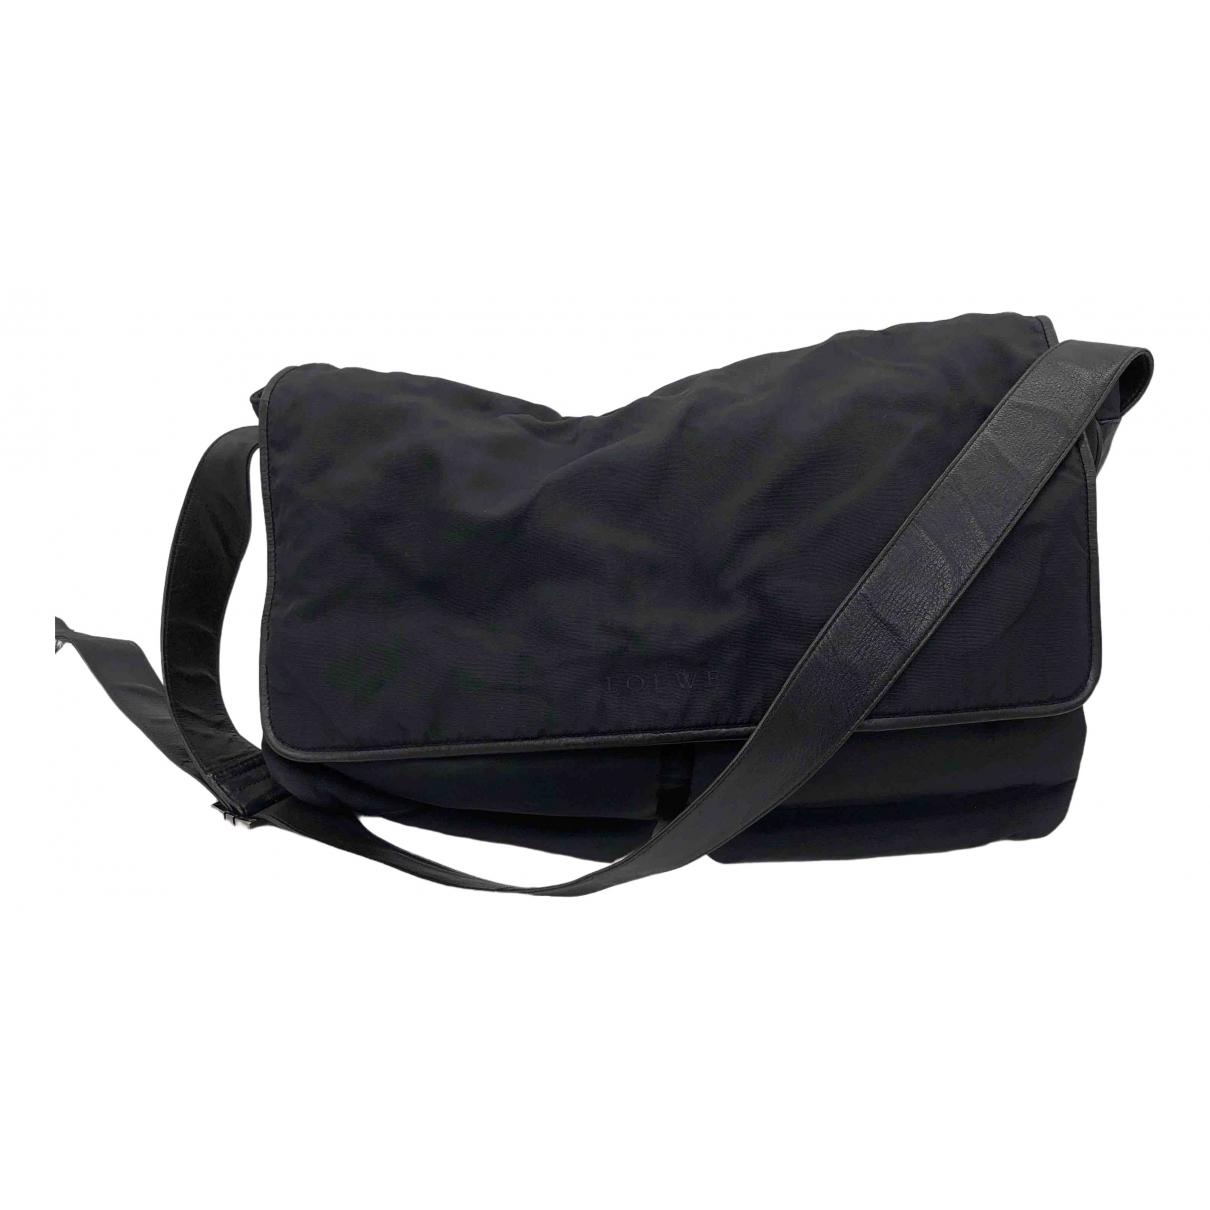 Loewe \N Handtasche in  Schwarz Baumwolle